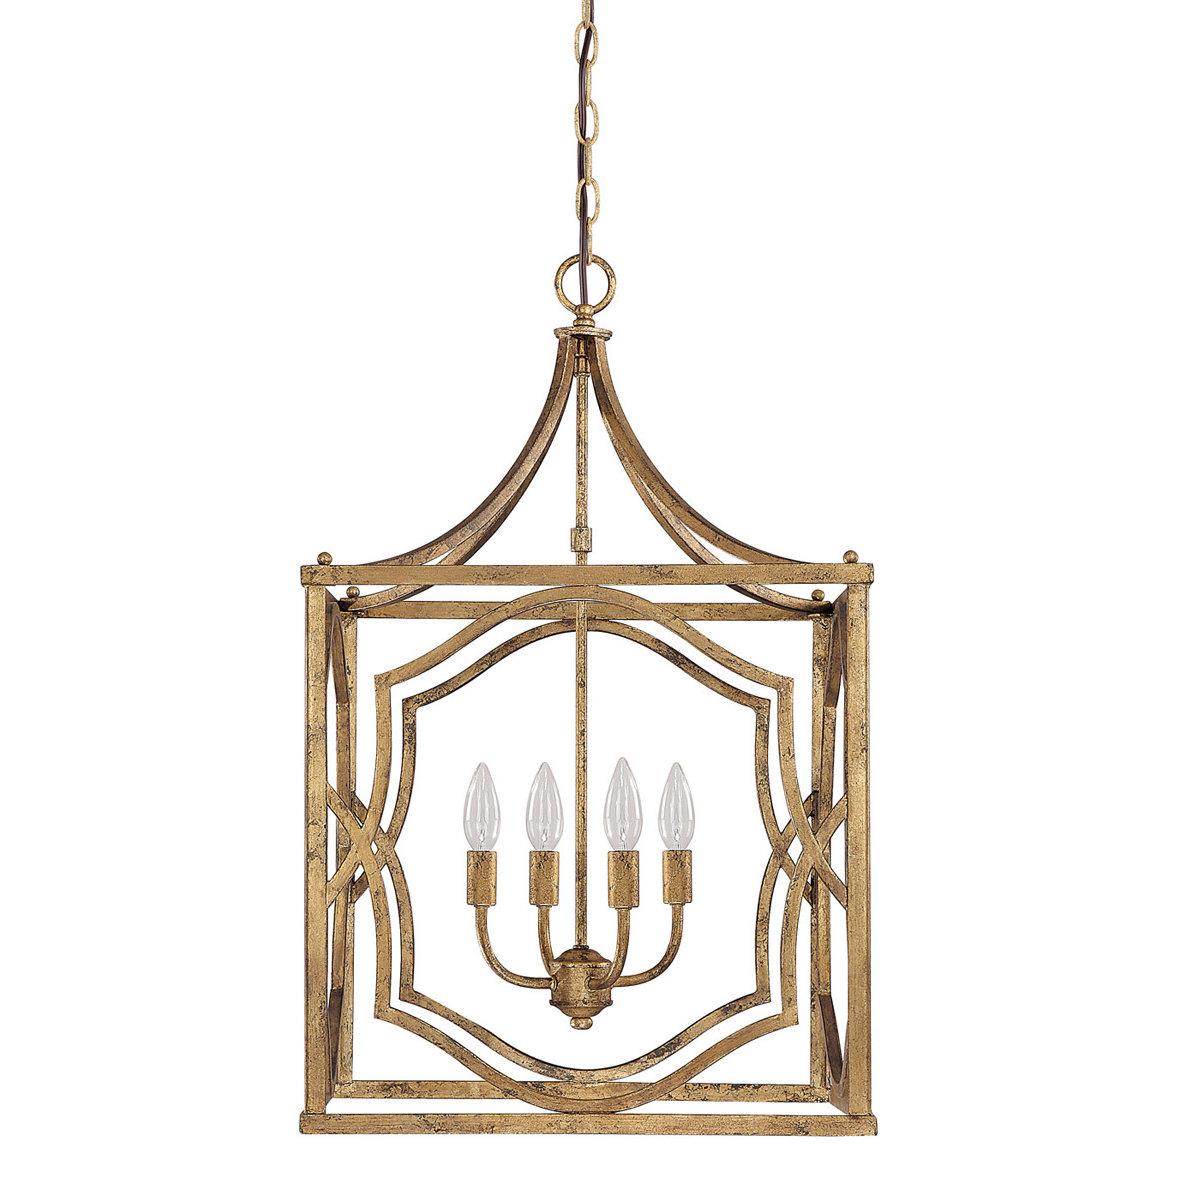 Destrey 4 Light Lantern Square / Rectangle Pendant Regarding Destrey 3 Light Lantern Square/rectangle Pendants (Gallery 5 of 30)